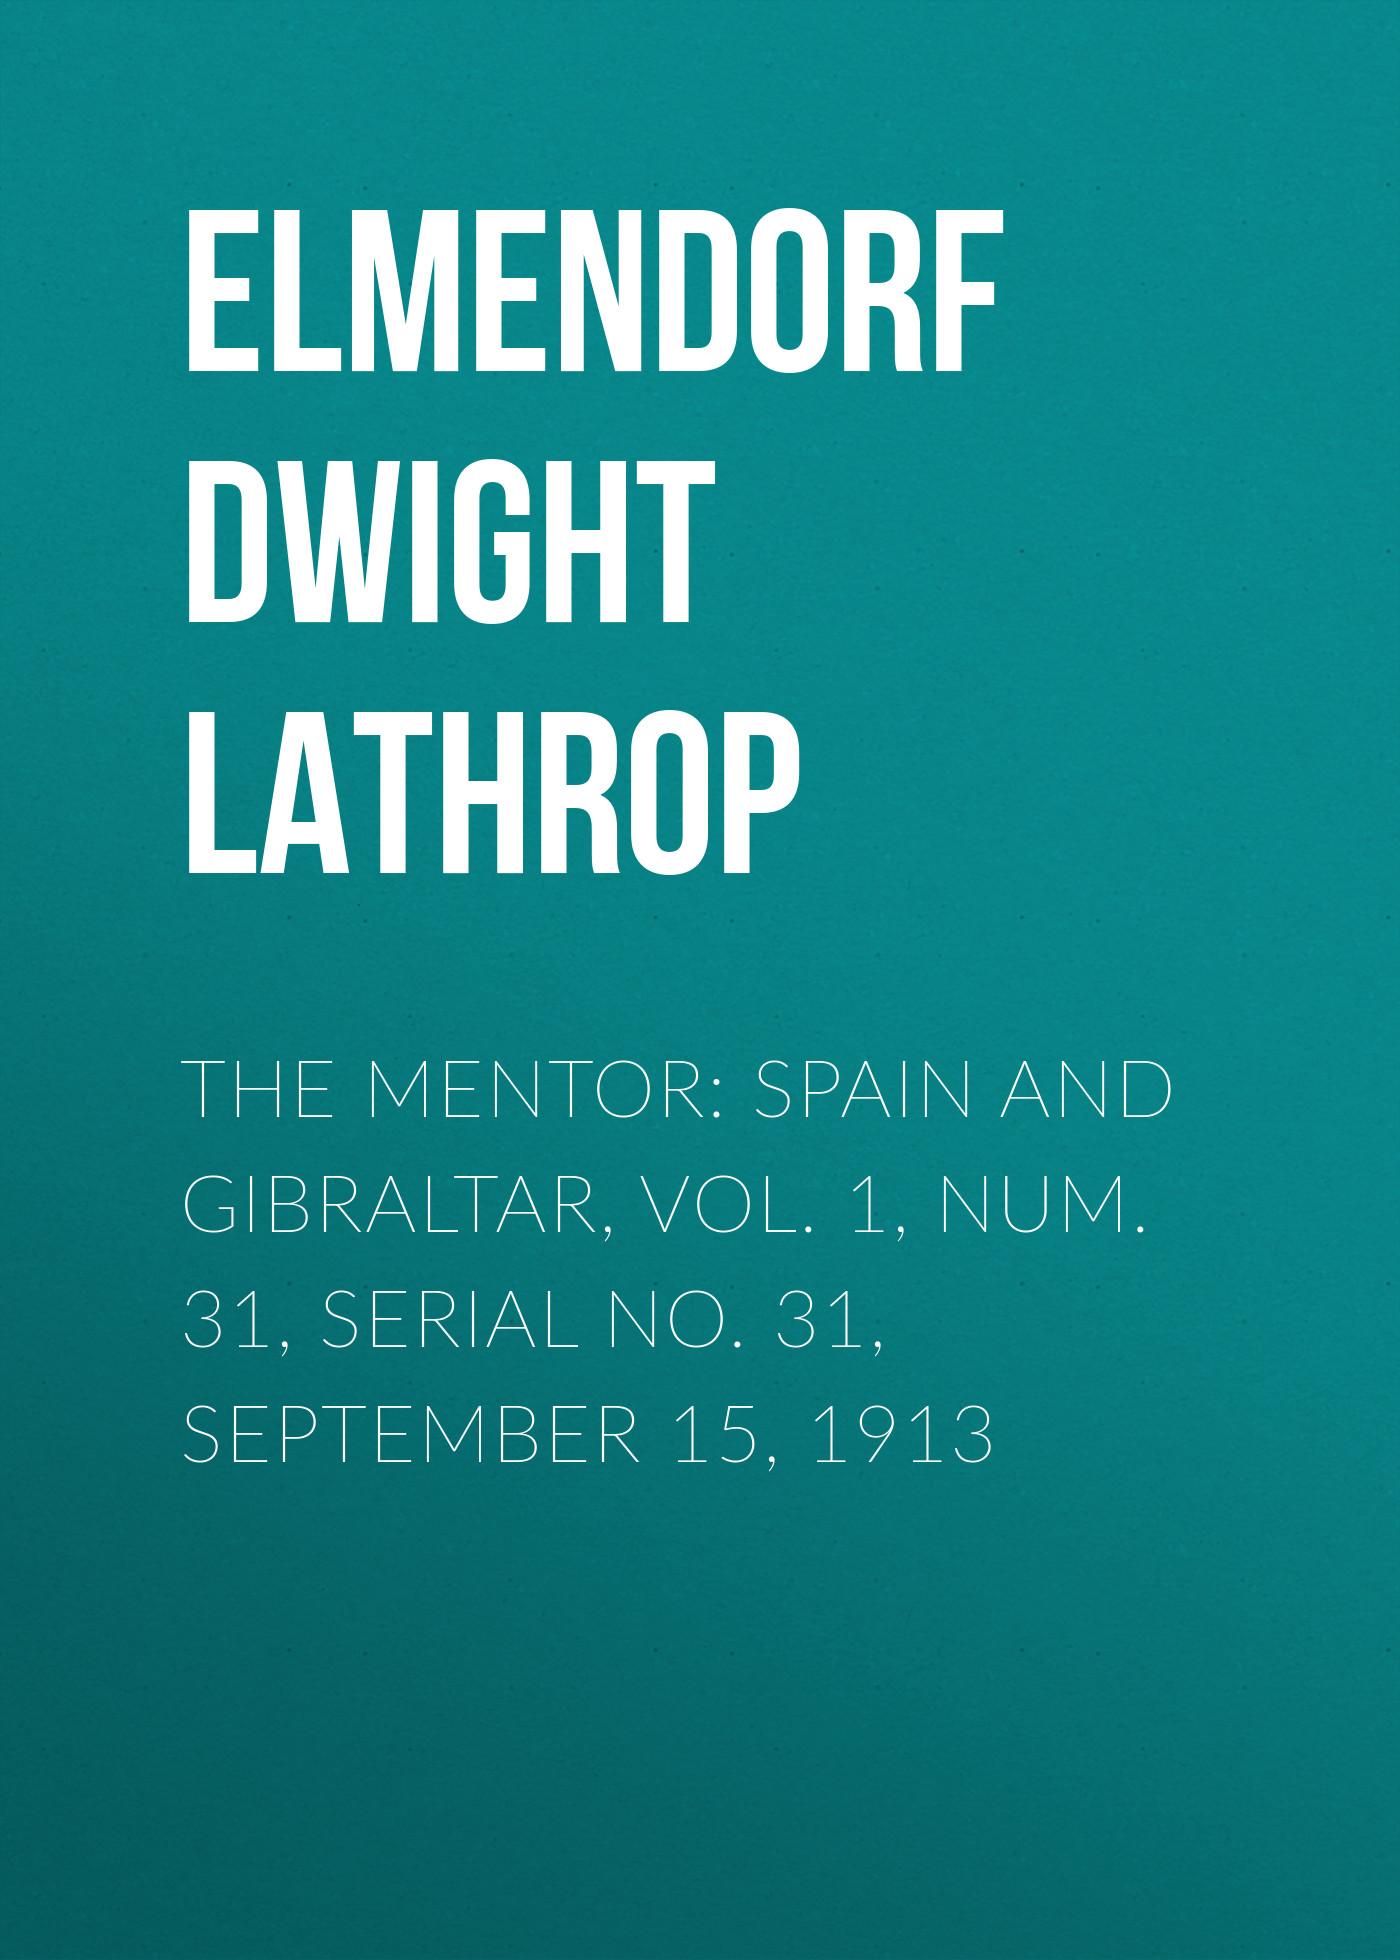 Elmendorf Dwight Lathrop The Mentor: Spain and Gibraltar, Vol. 1, Num. 31, Serial No. 31, September 15, 1913 gibraltar sc bpl